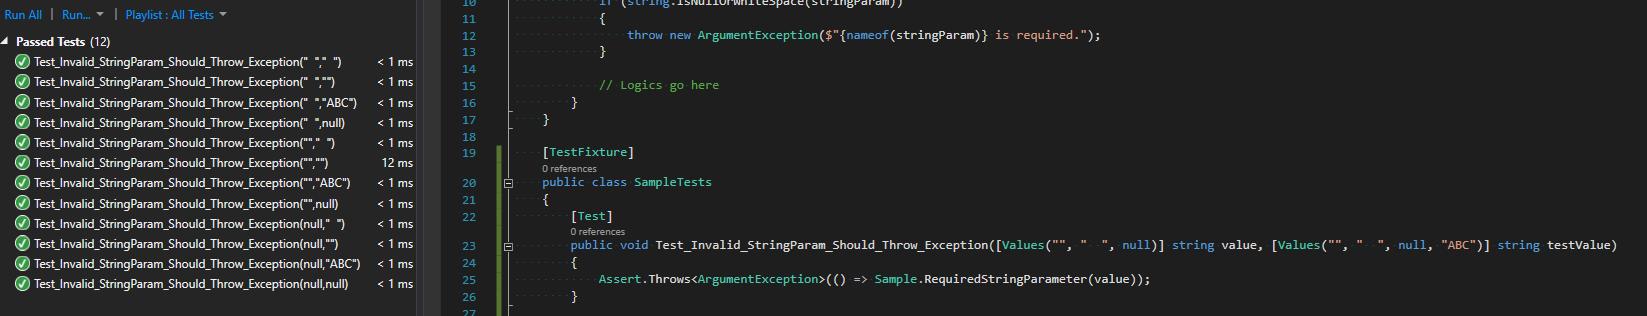 Add multiple test cases for same unit test scenario in NUnit – Just